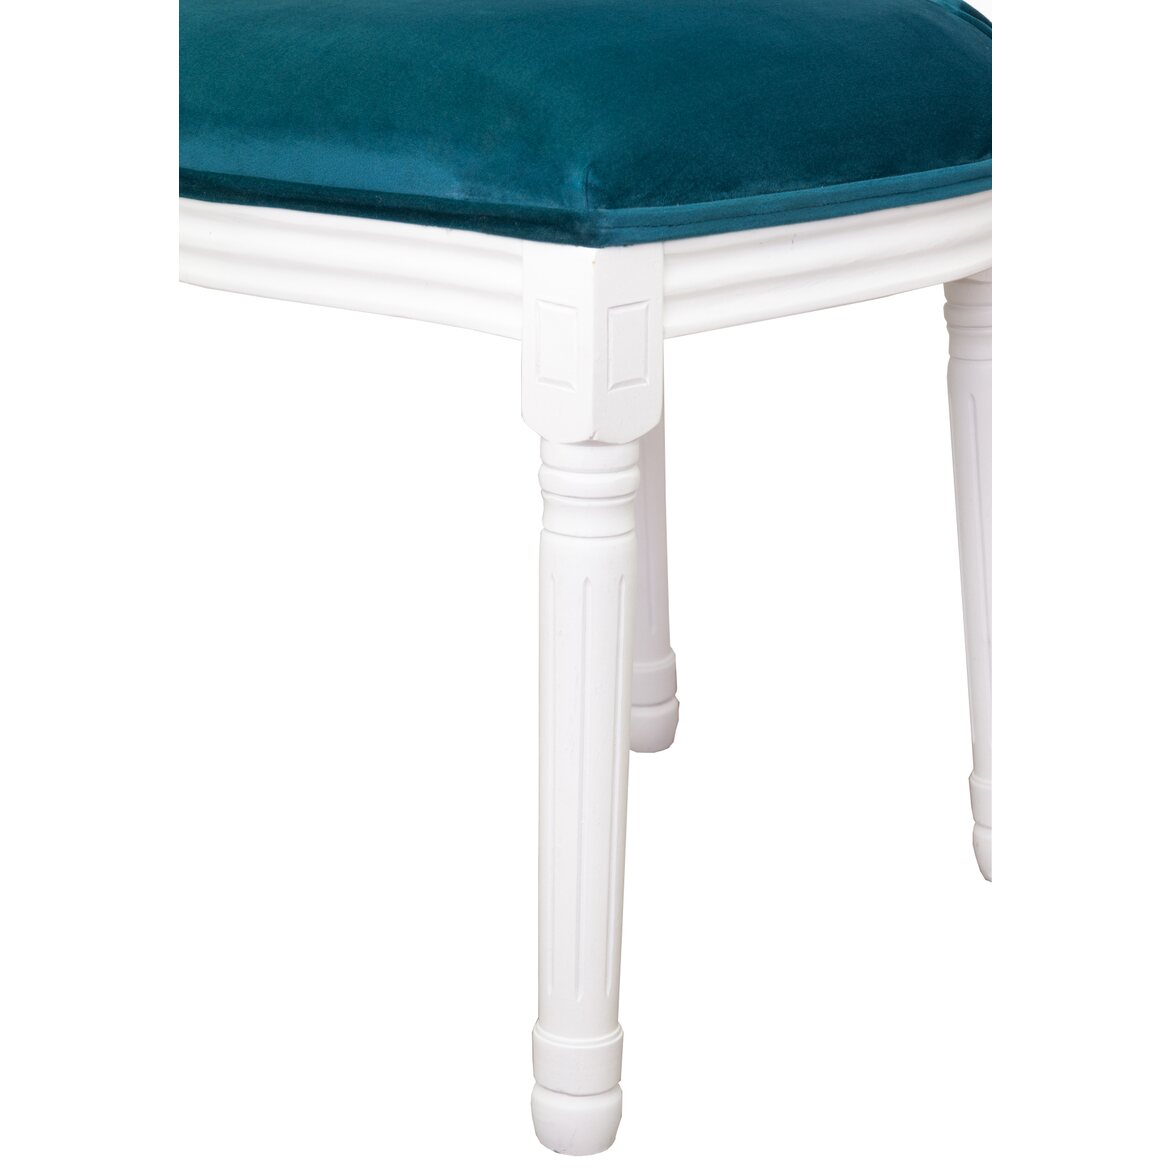 Стул Volker blue +white 5   Обеденные стулья Kingsby